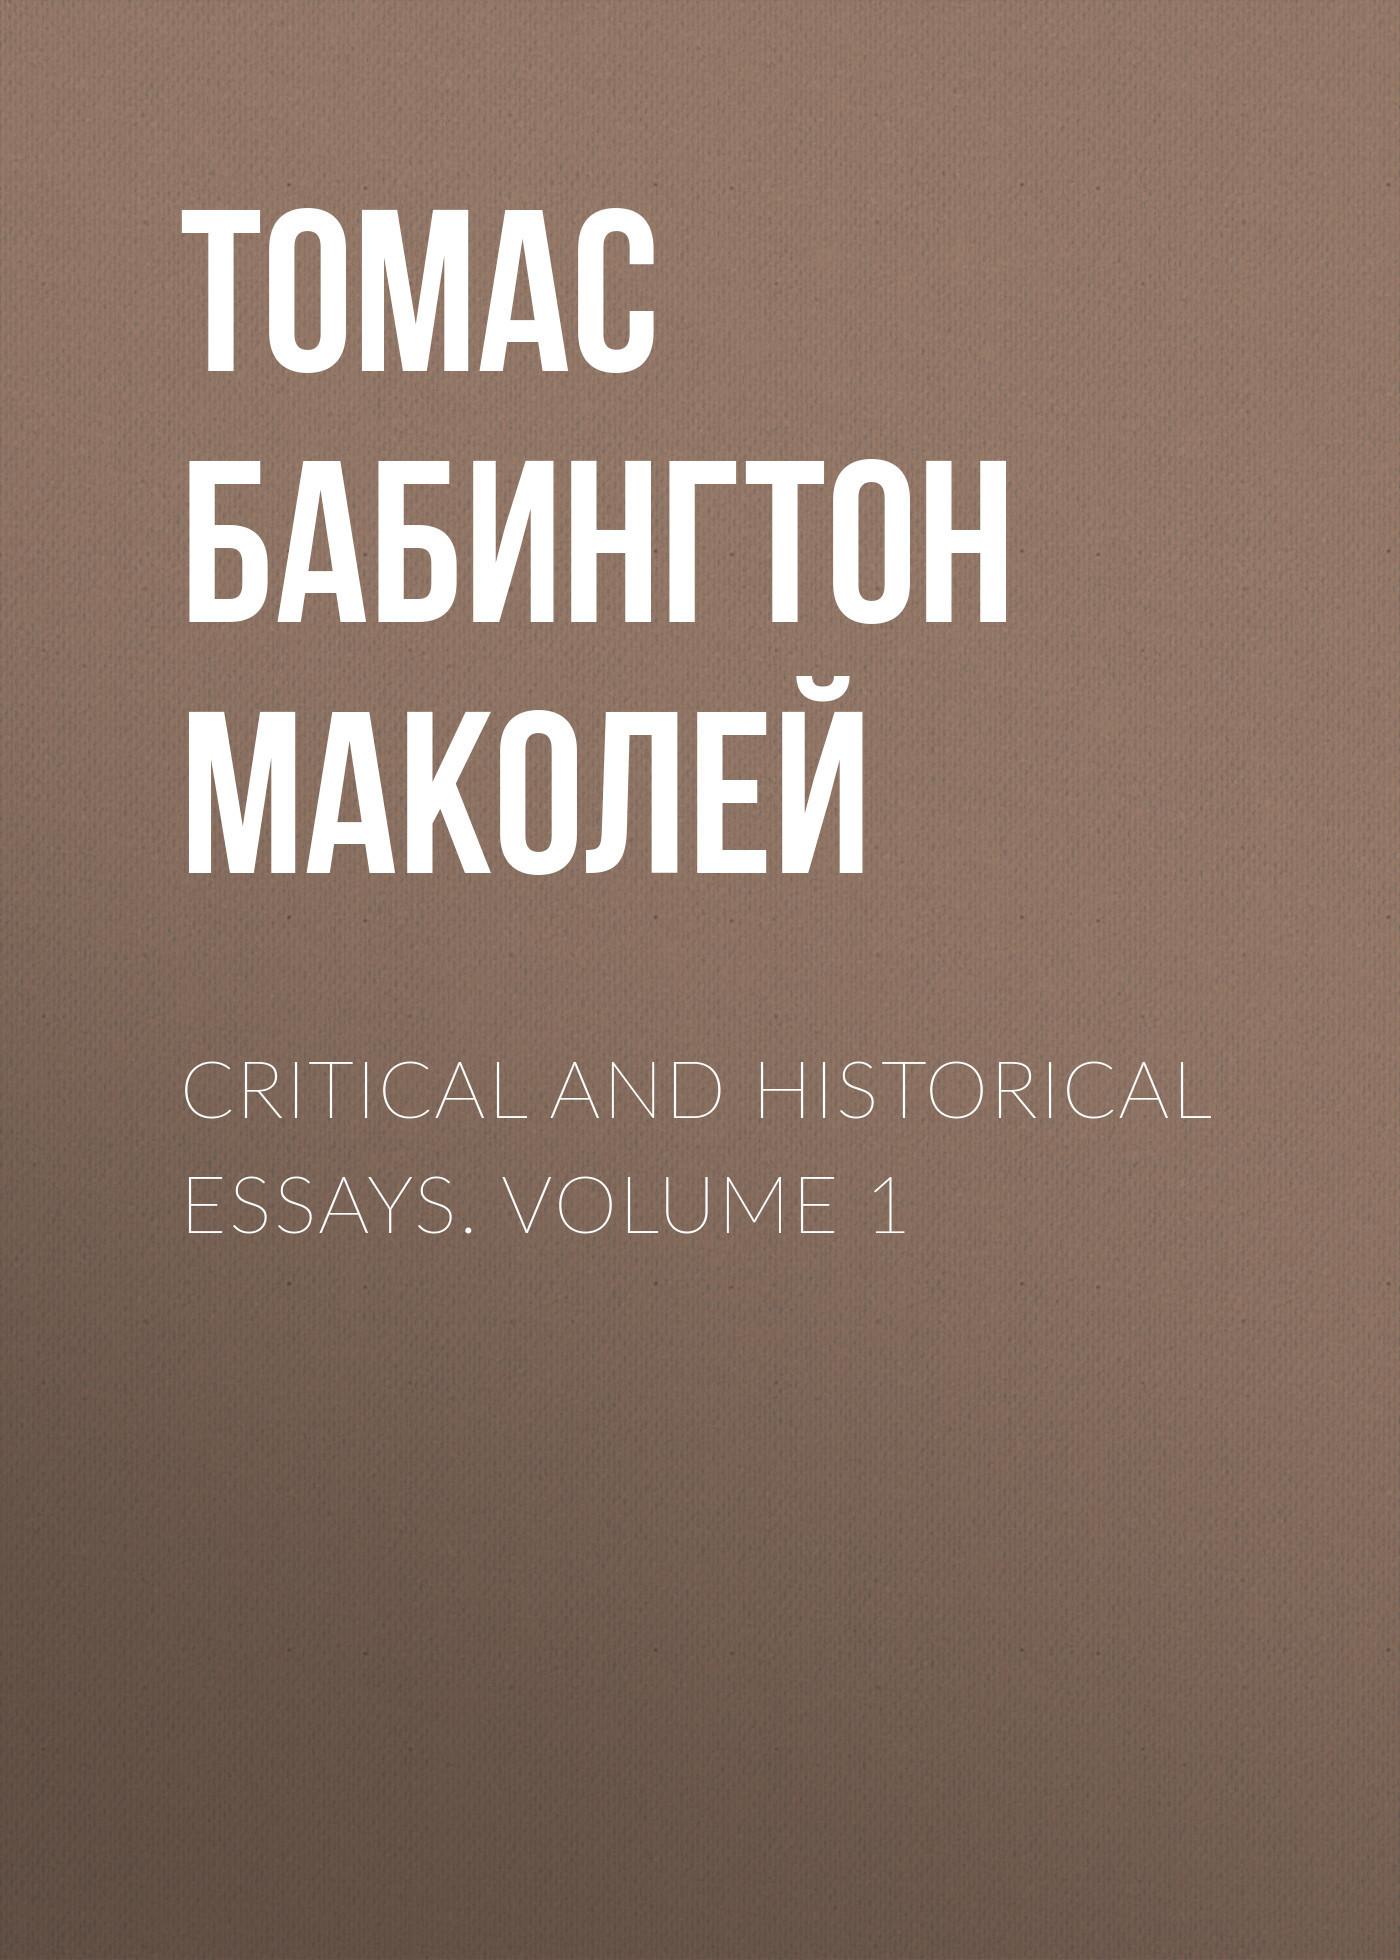 Томас Бабингтон Маколей Critical and Historical Essays. Volume 1